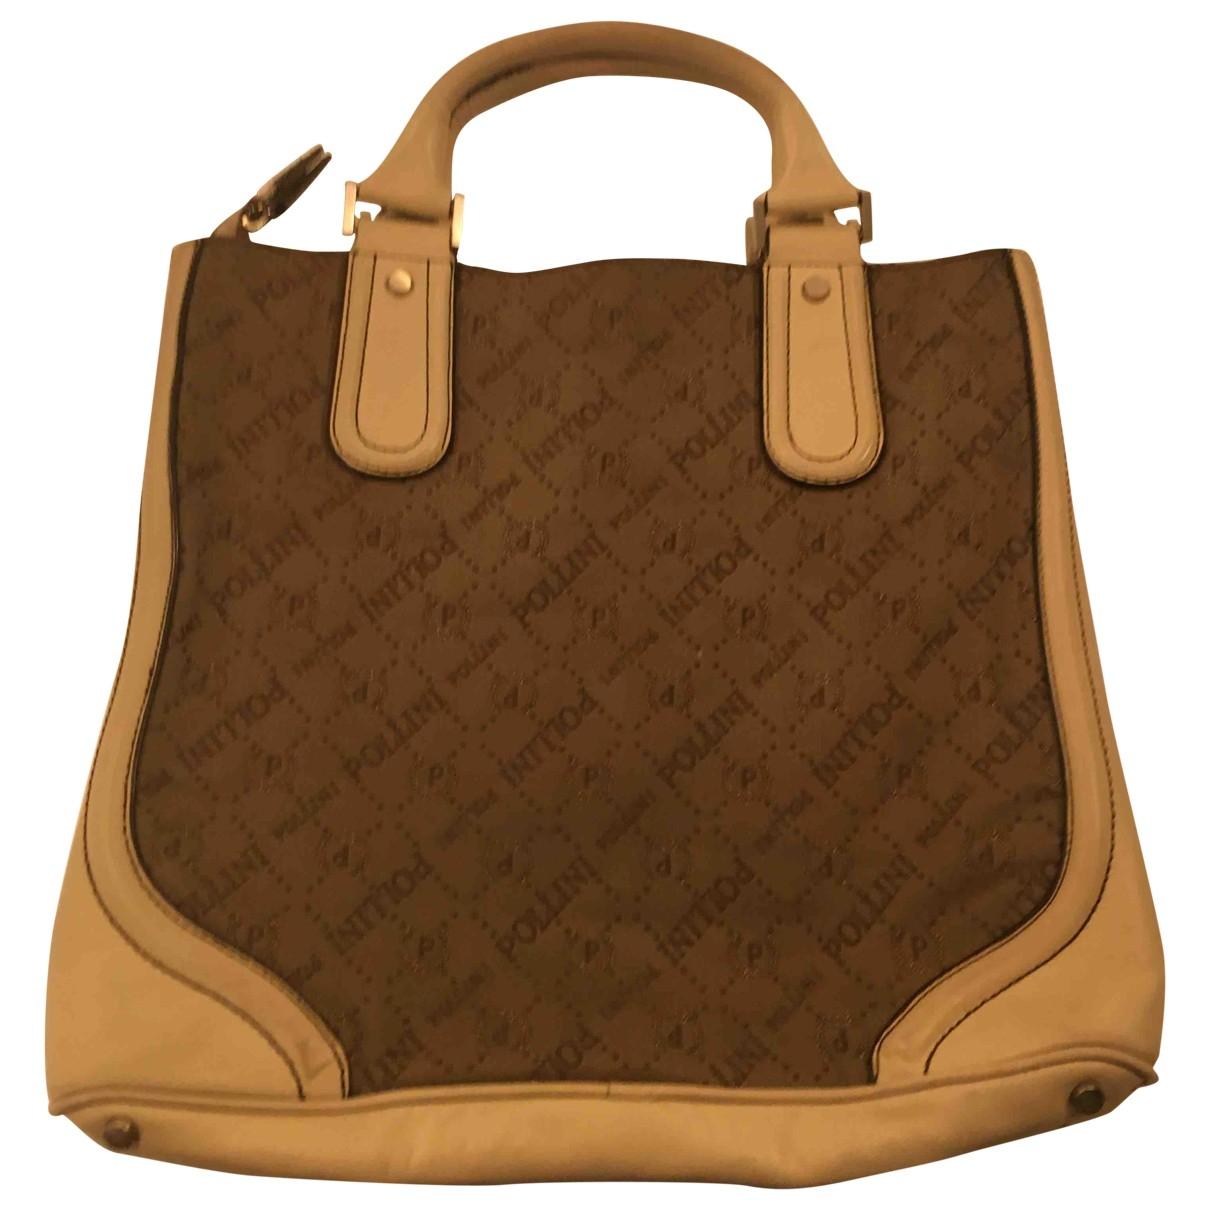 Pollini \N Handtasche in  Beige Denim - Jeans